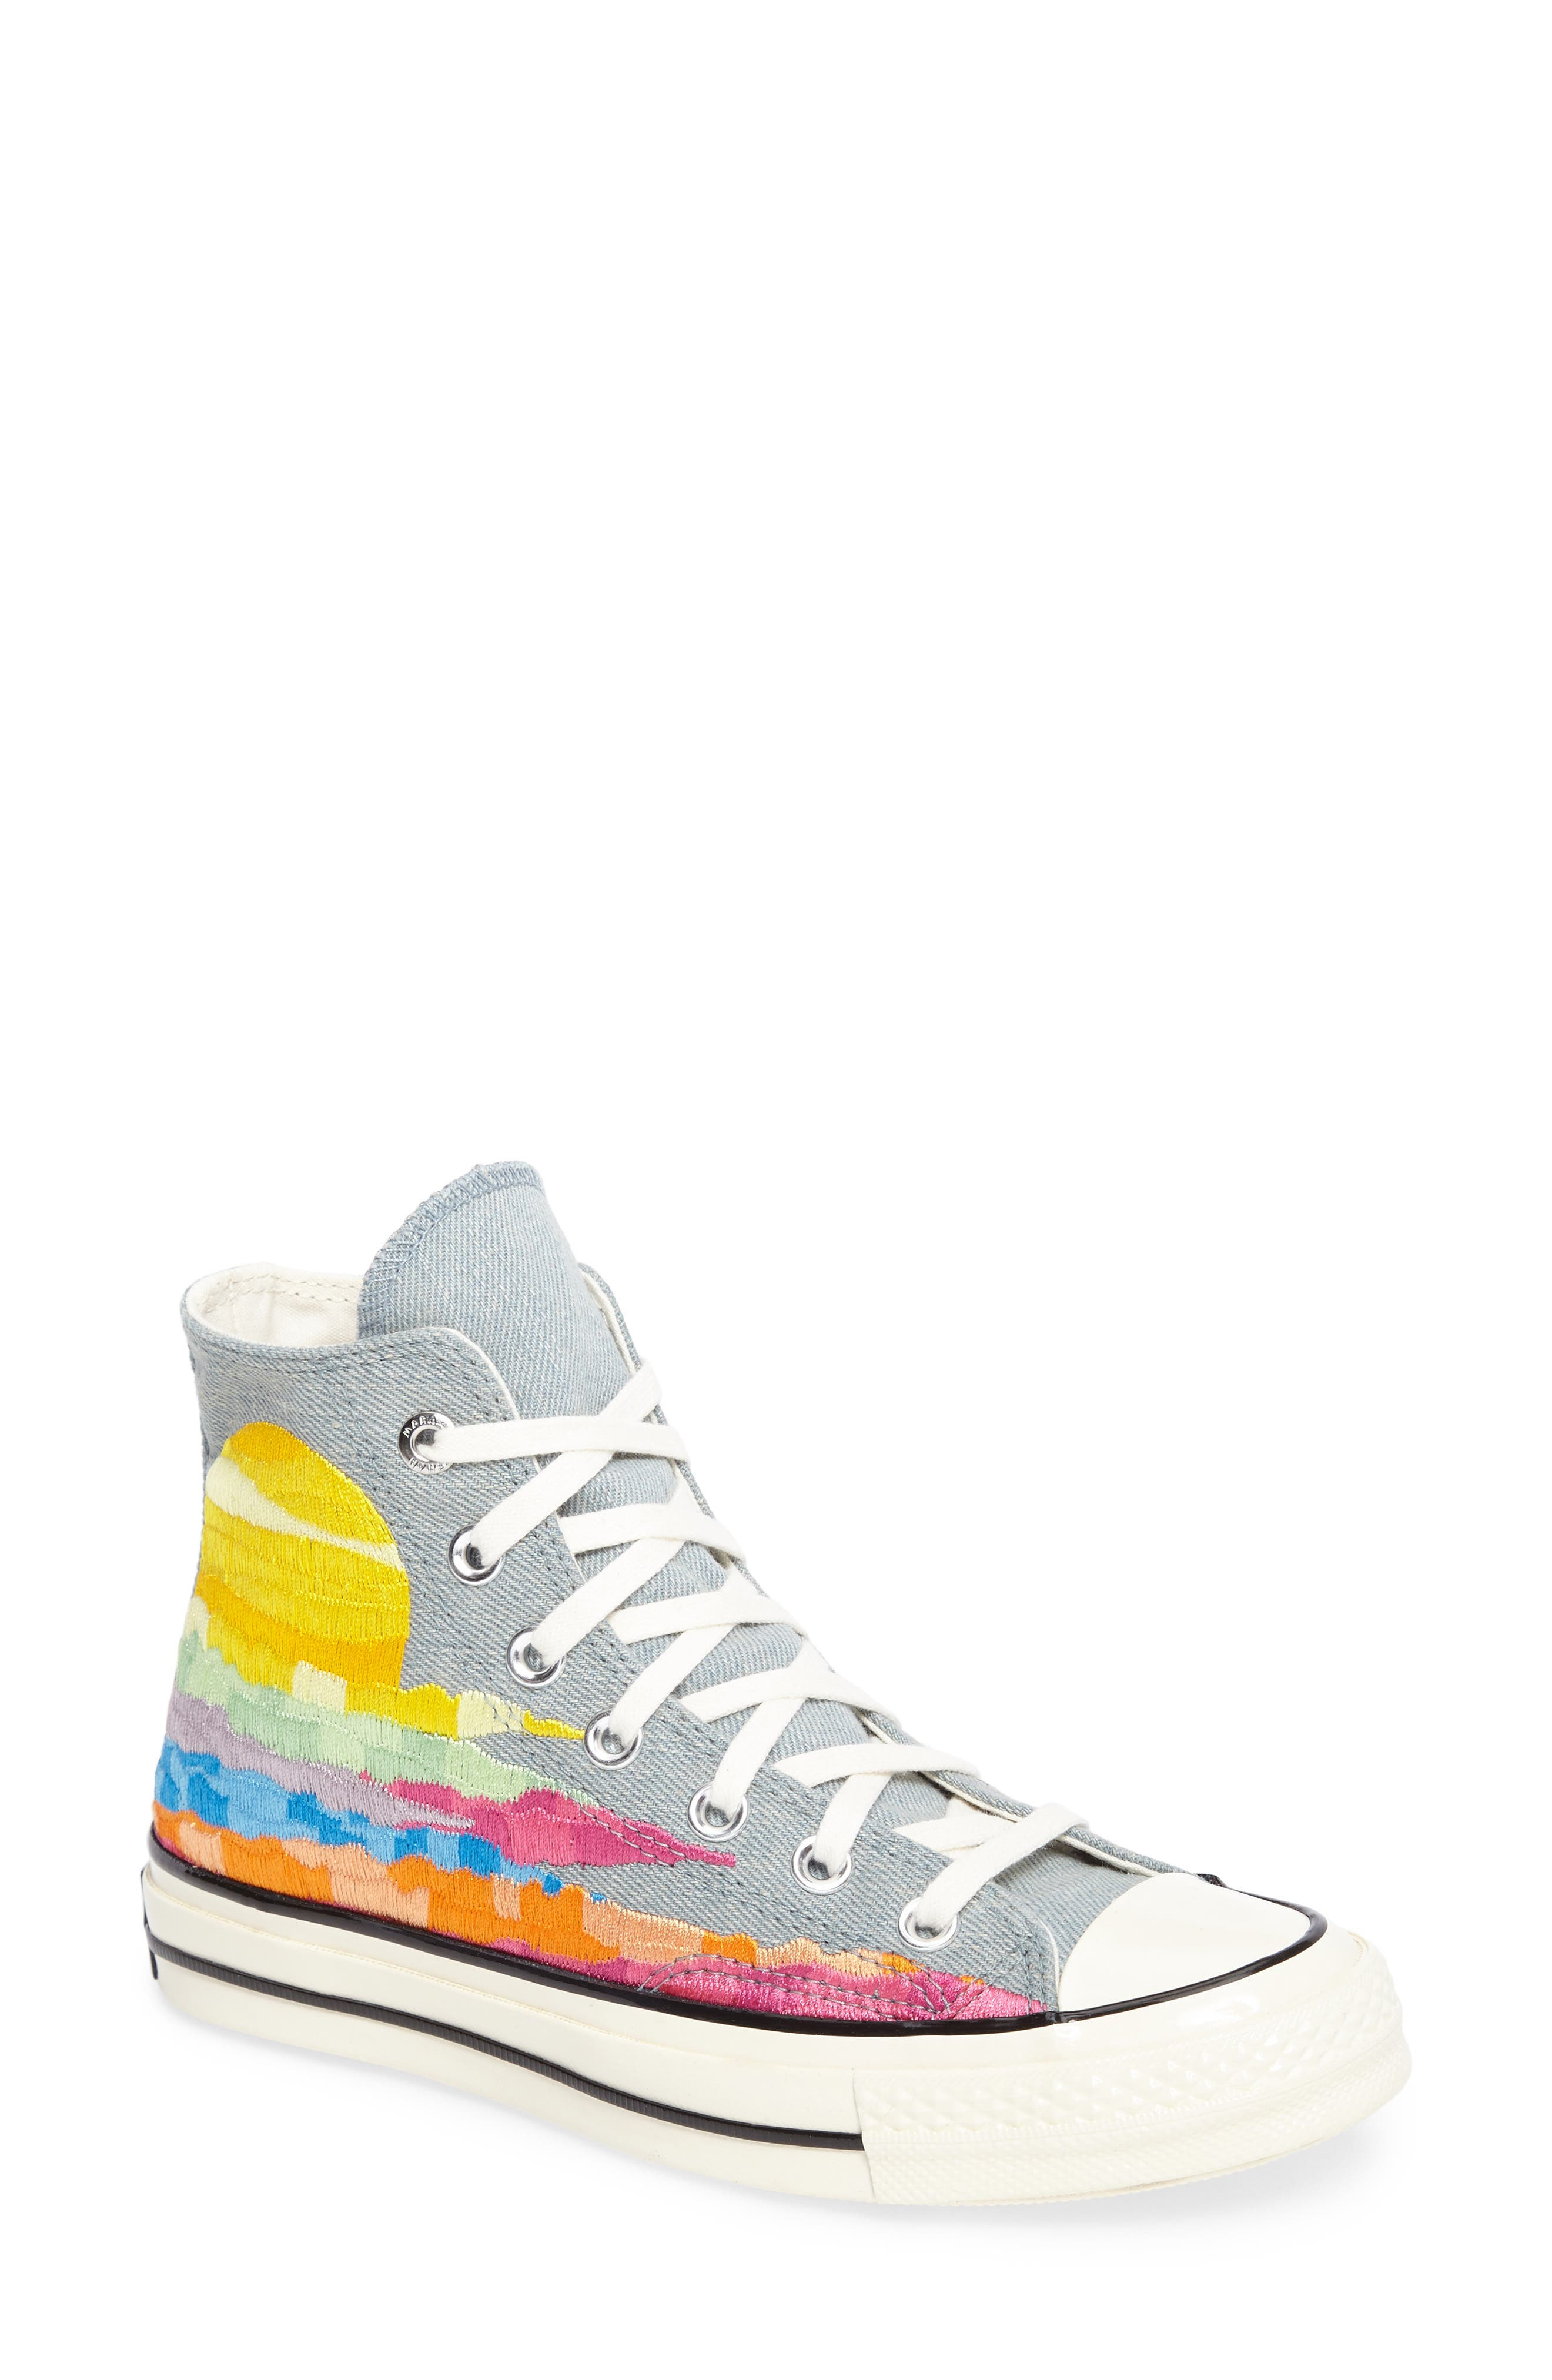 Main Image - Converse x Mara Hoffman All Star® Embroidered High Top Sneaker (Women)